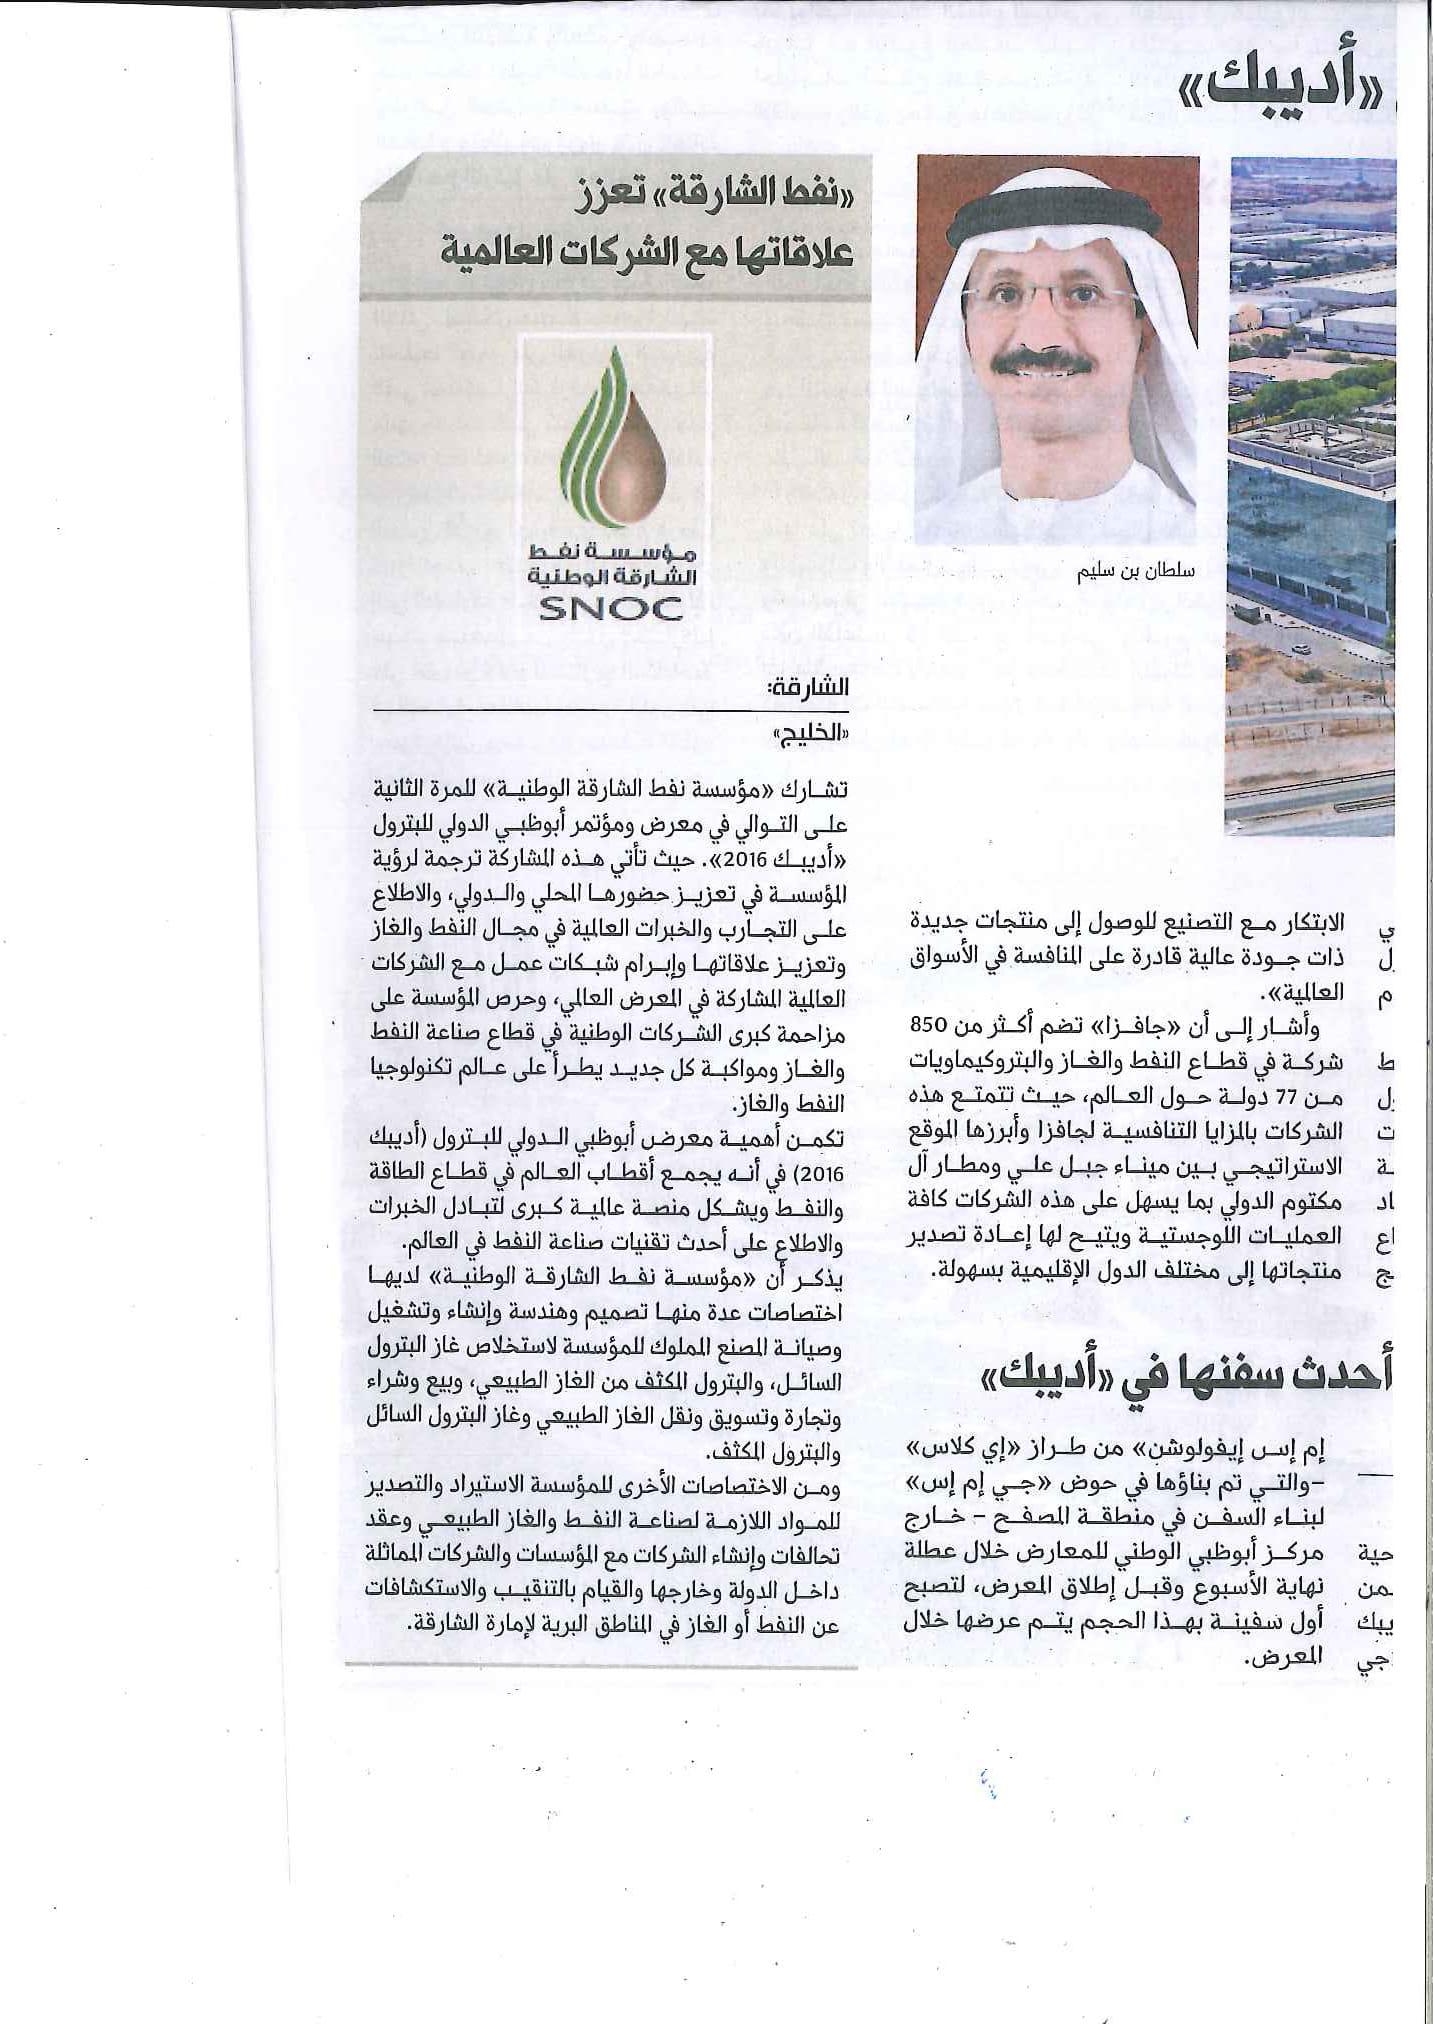 adepic press release Arabic - 2016-1